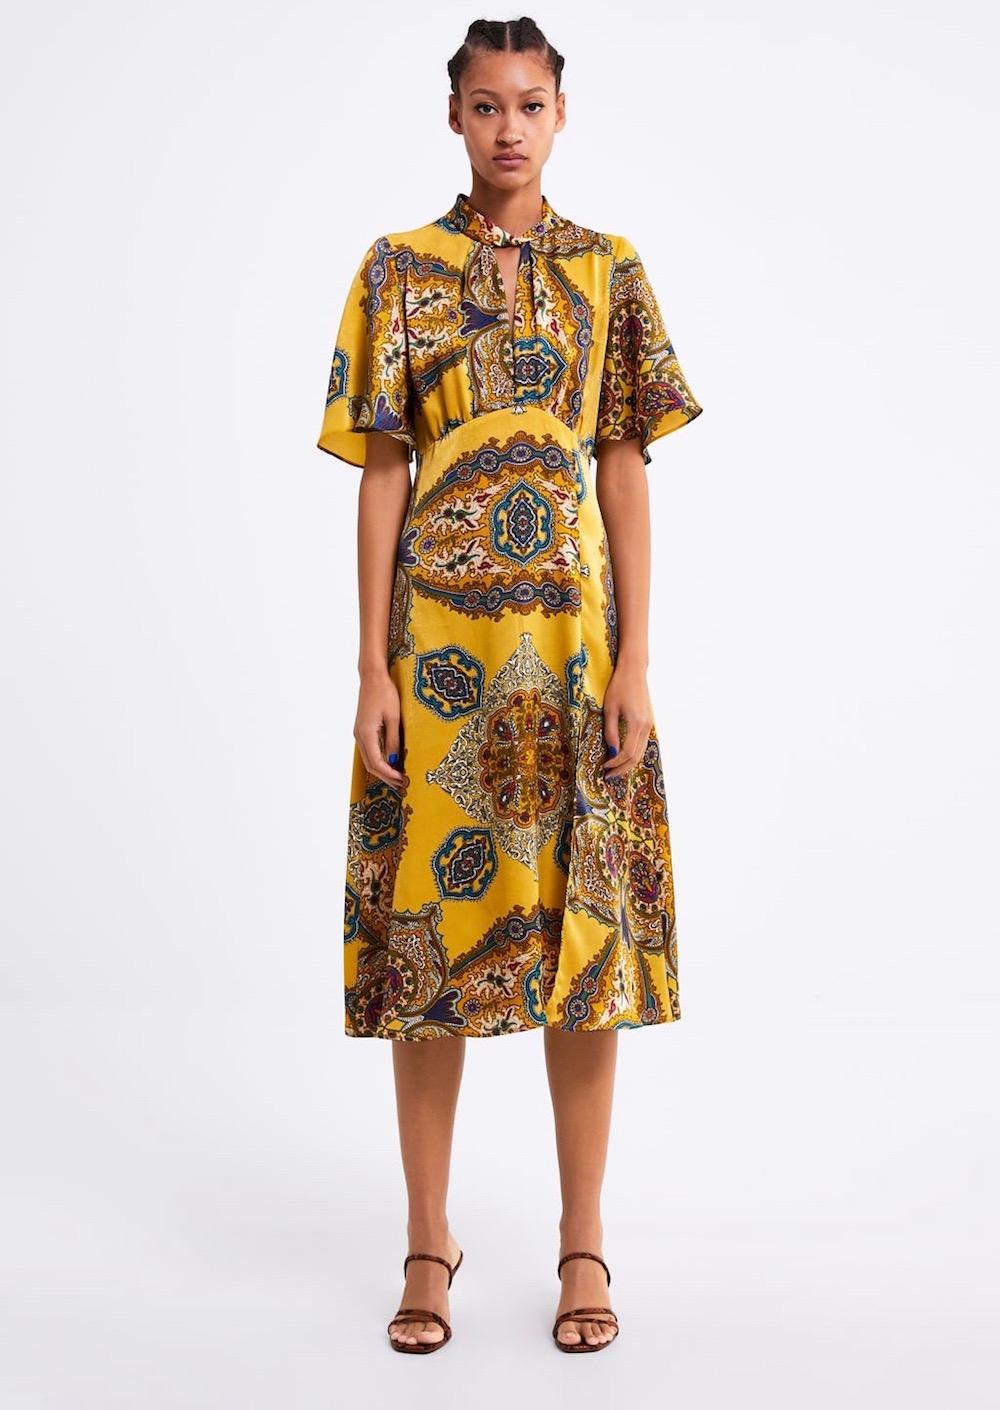 Zara  10 Versatile Dresses That Will Take You From Work to Play Zara Print Dress